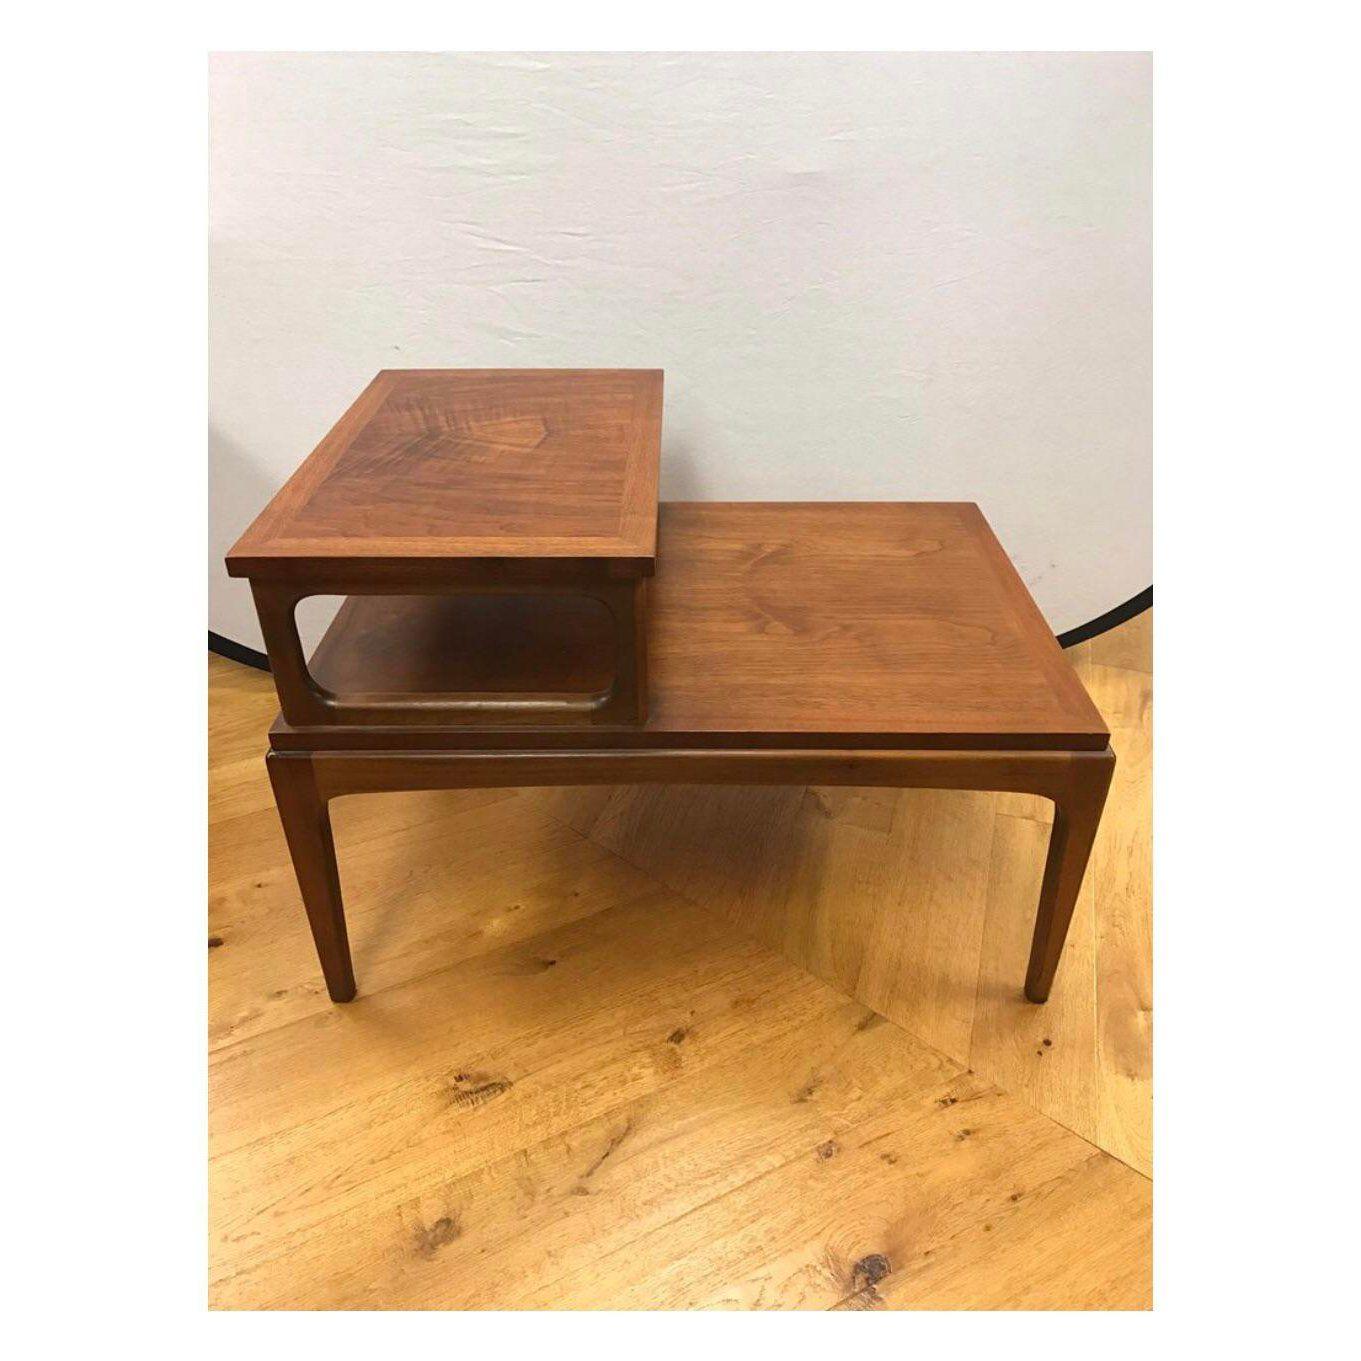 Altavista Lane Pair Of Midcentury Lane Altavista End Tables Nightstands For Sale Image 4 Of 11 In 1912 John Lane